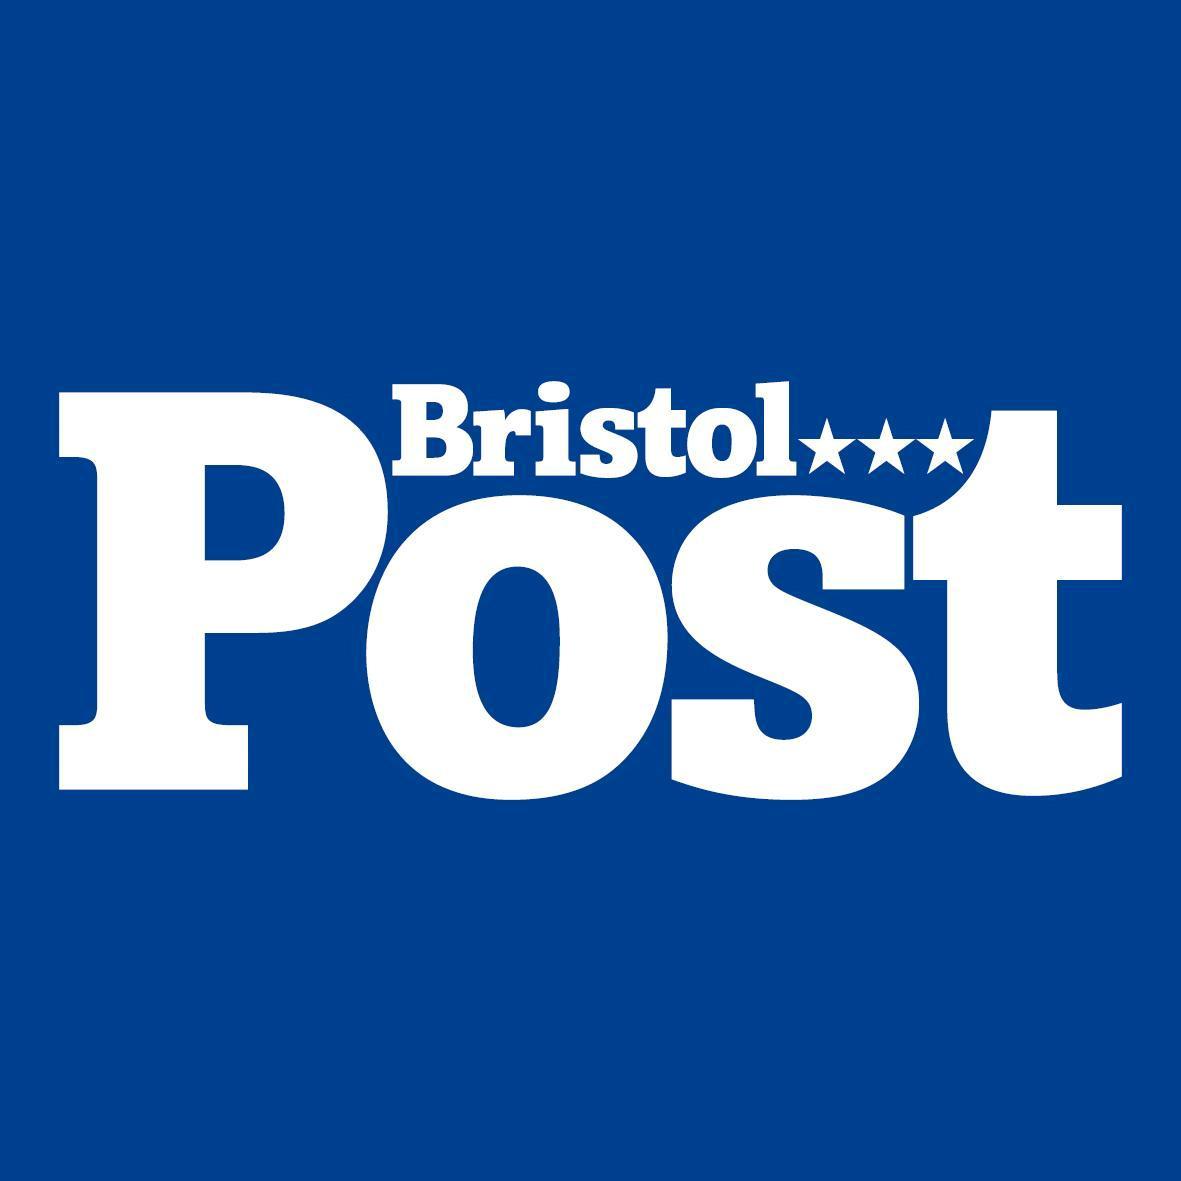 The Bristol Post logo